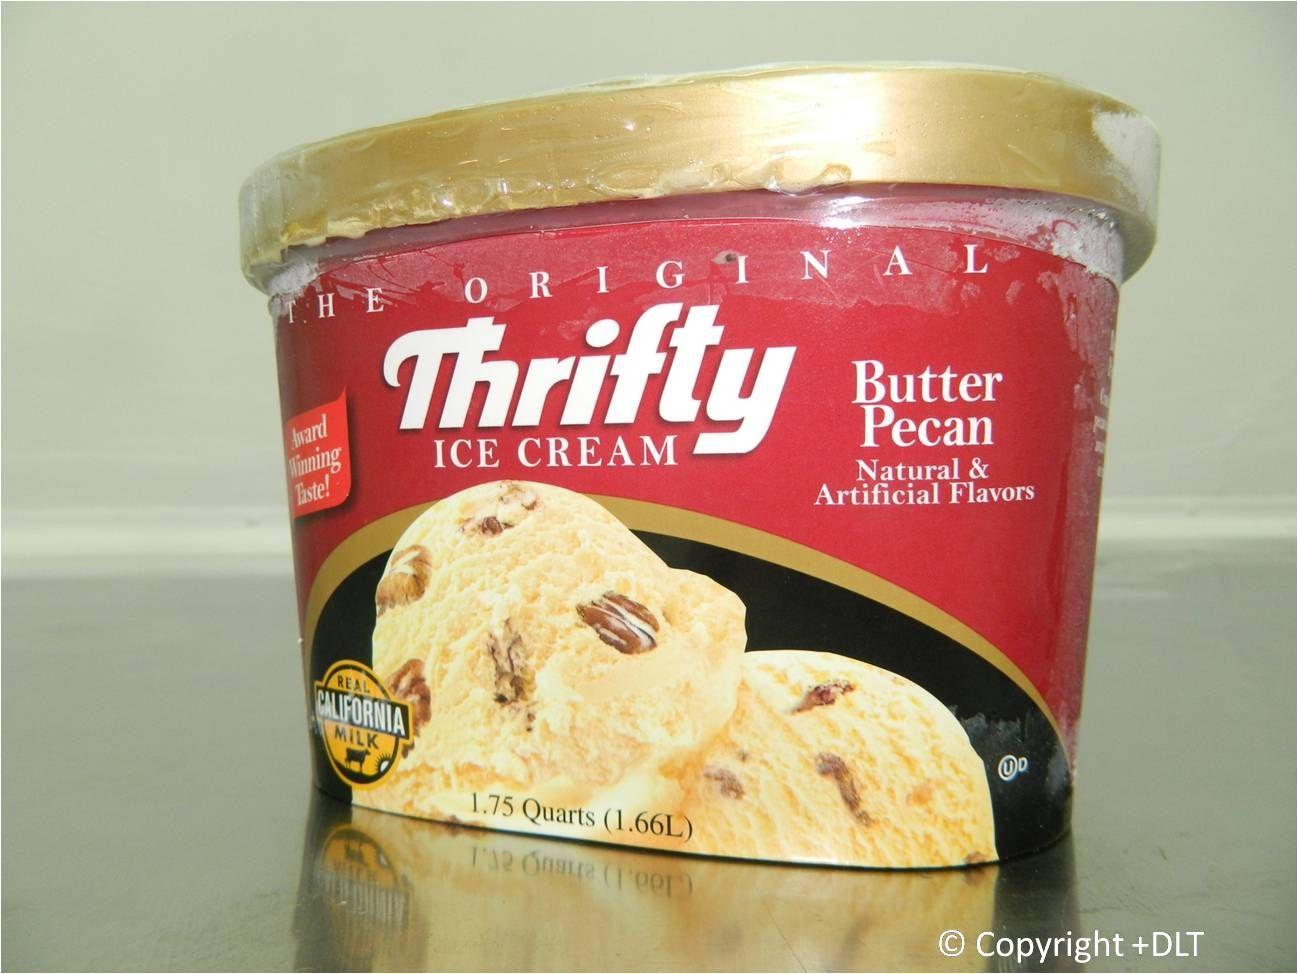 Coconut Pineapple Thrifty Ice Cream Flavor Thrifty Ice Cream